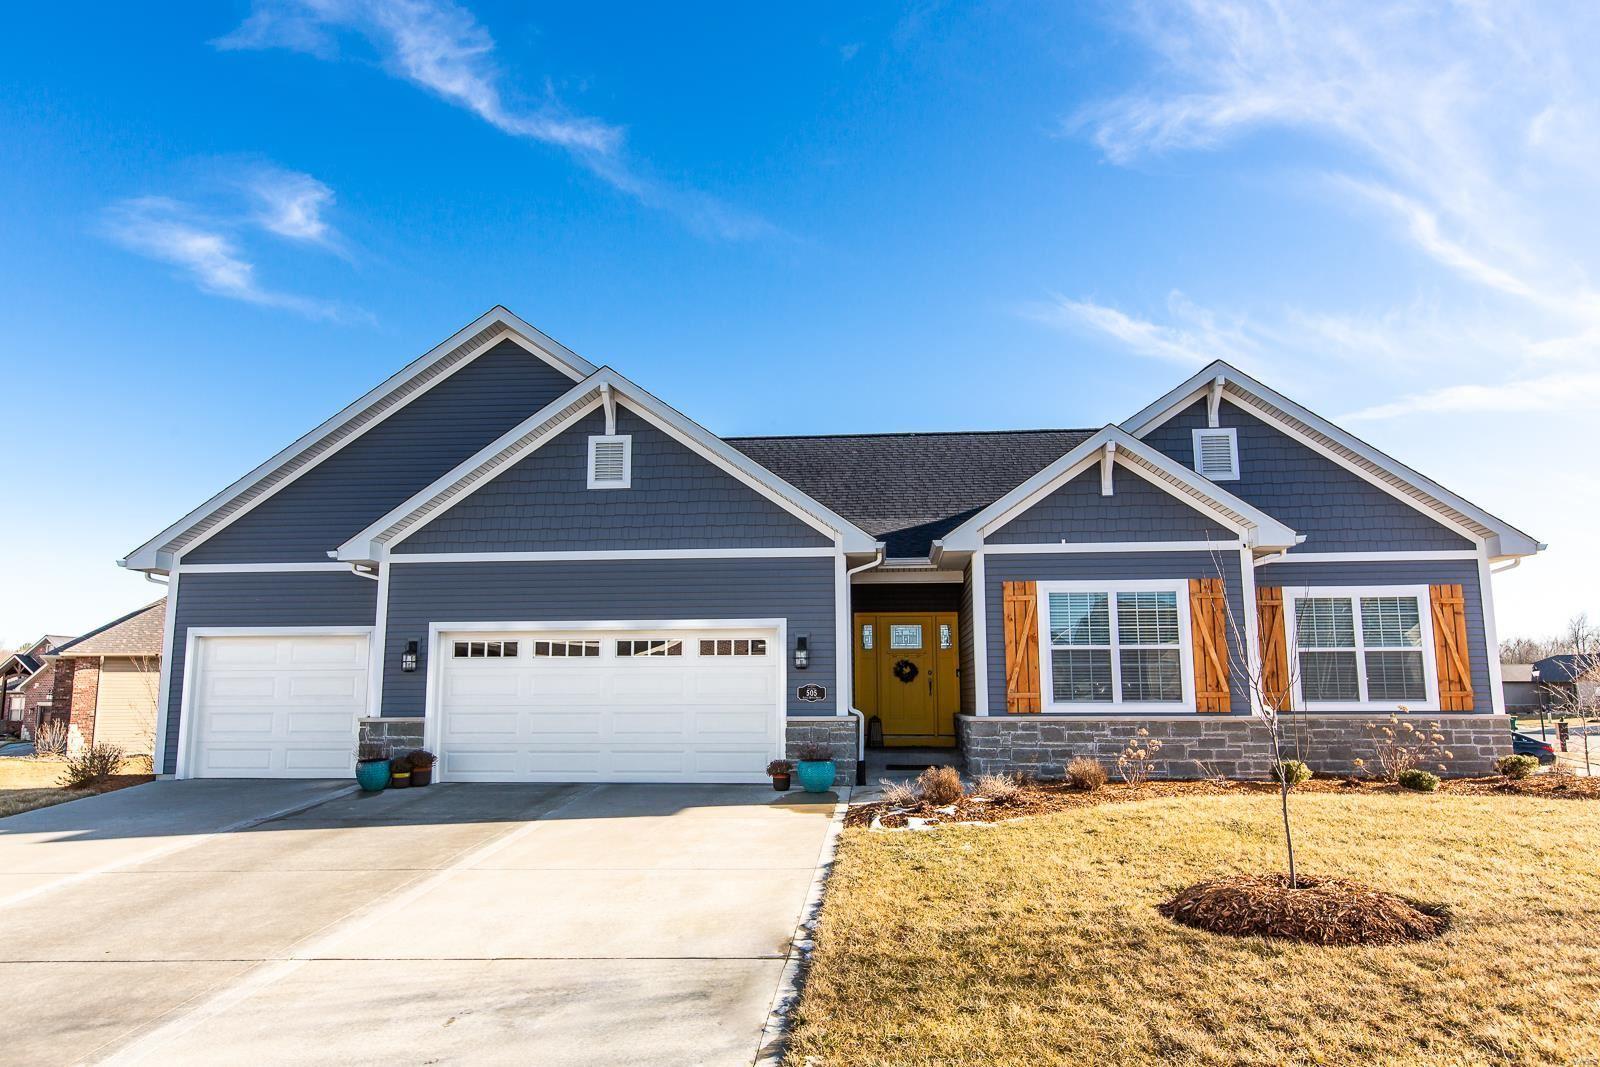 505 Alder Ridge Drive, OFallon, IL 62269 - MLS#: 21011283